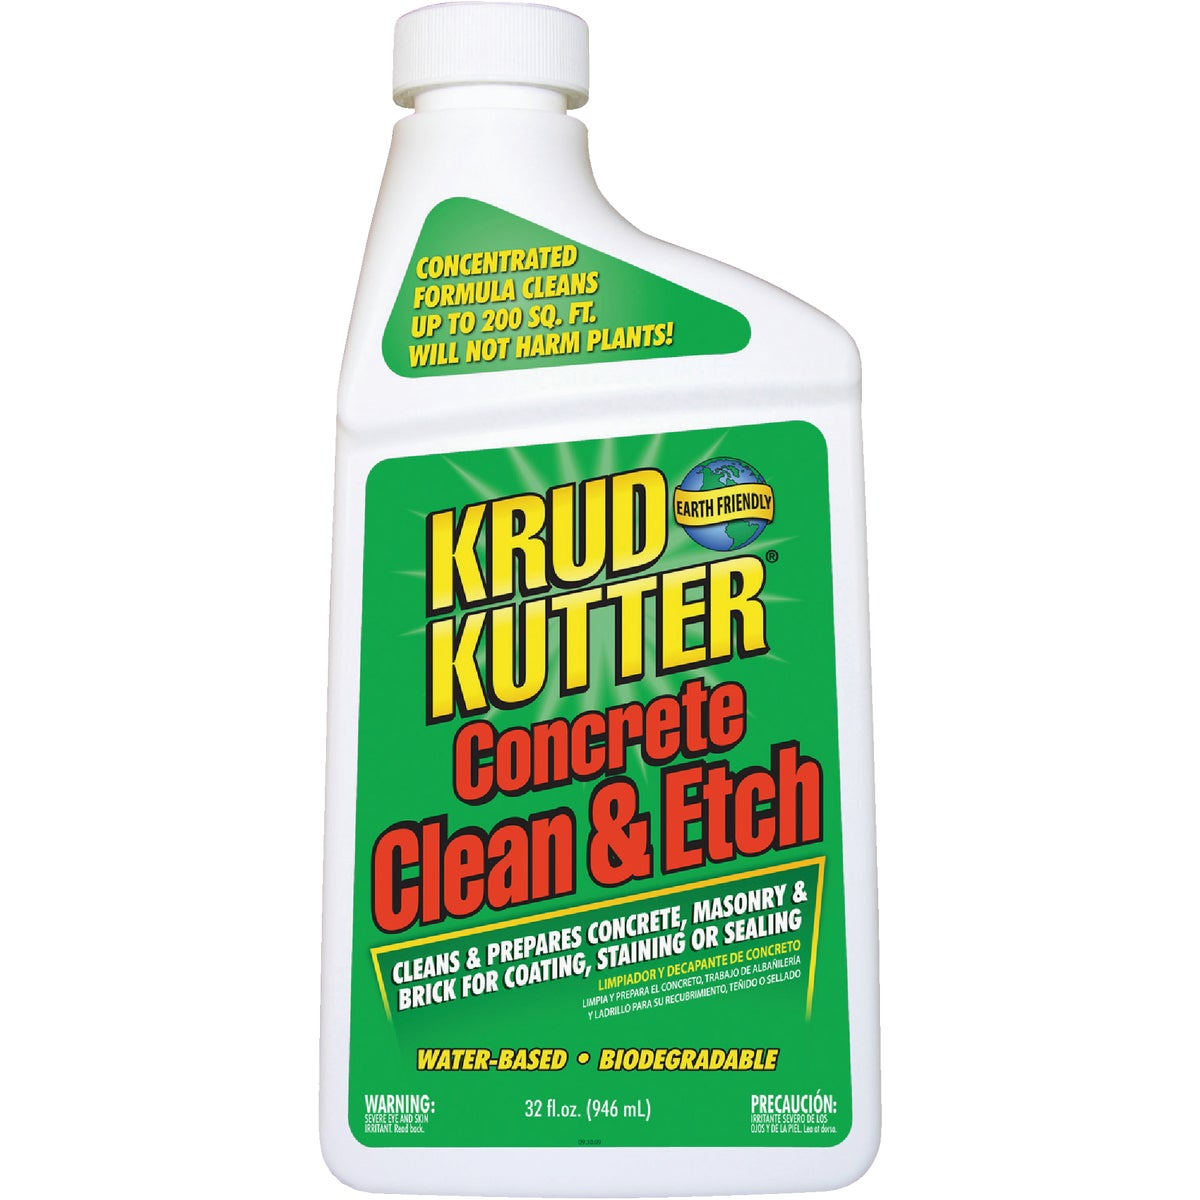 Supreme Chemical CONCRETE CLEANER/ETCHER CE32/6